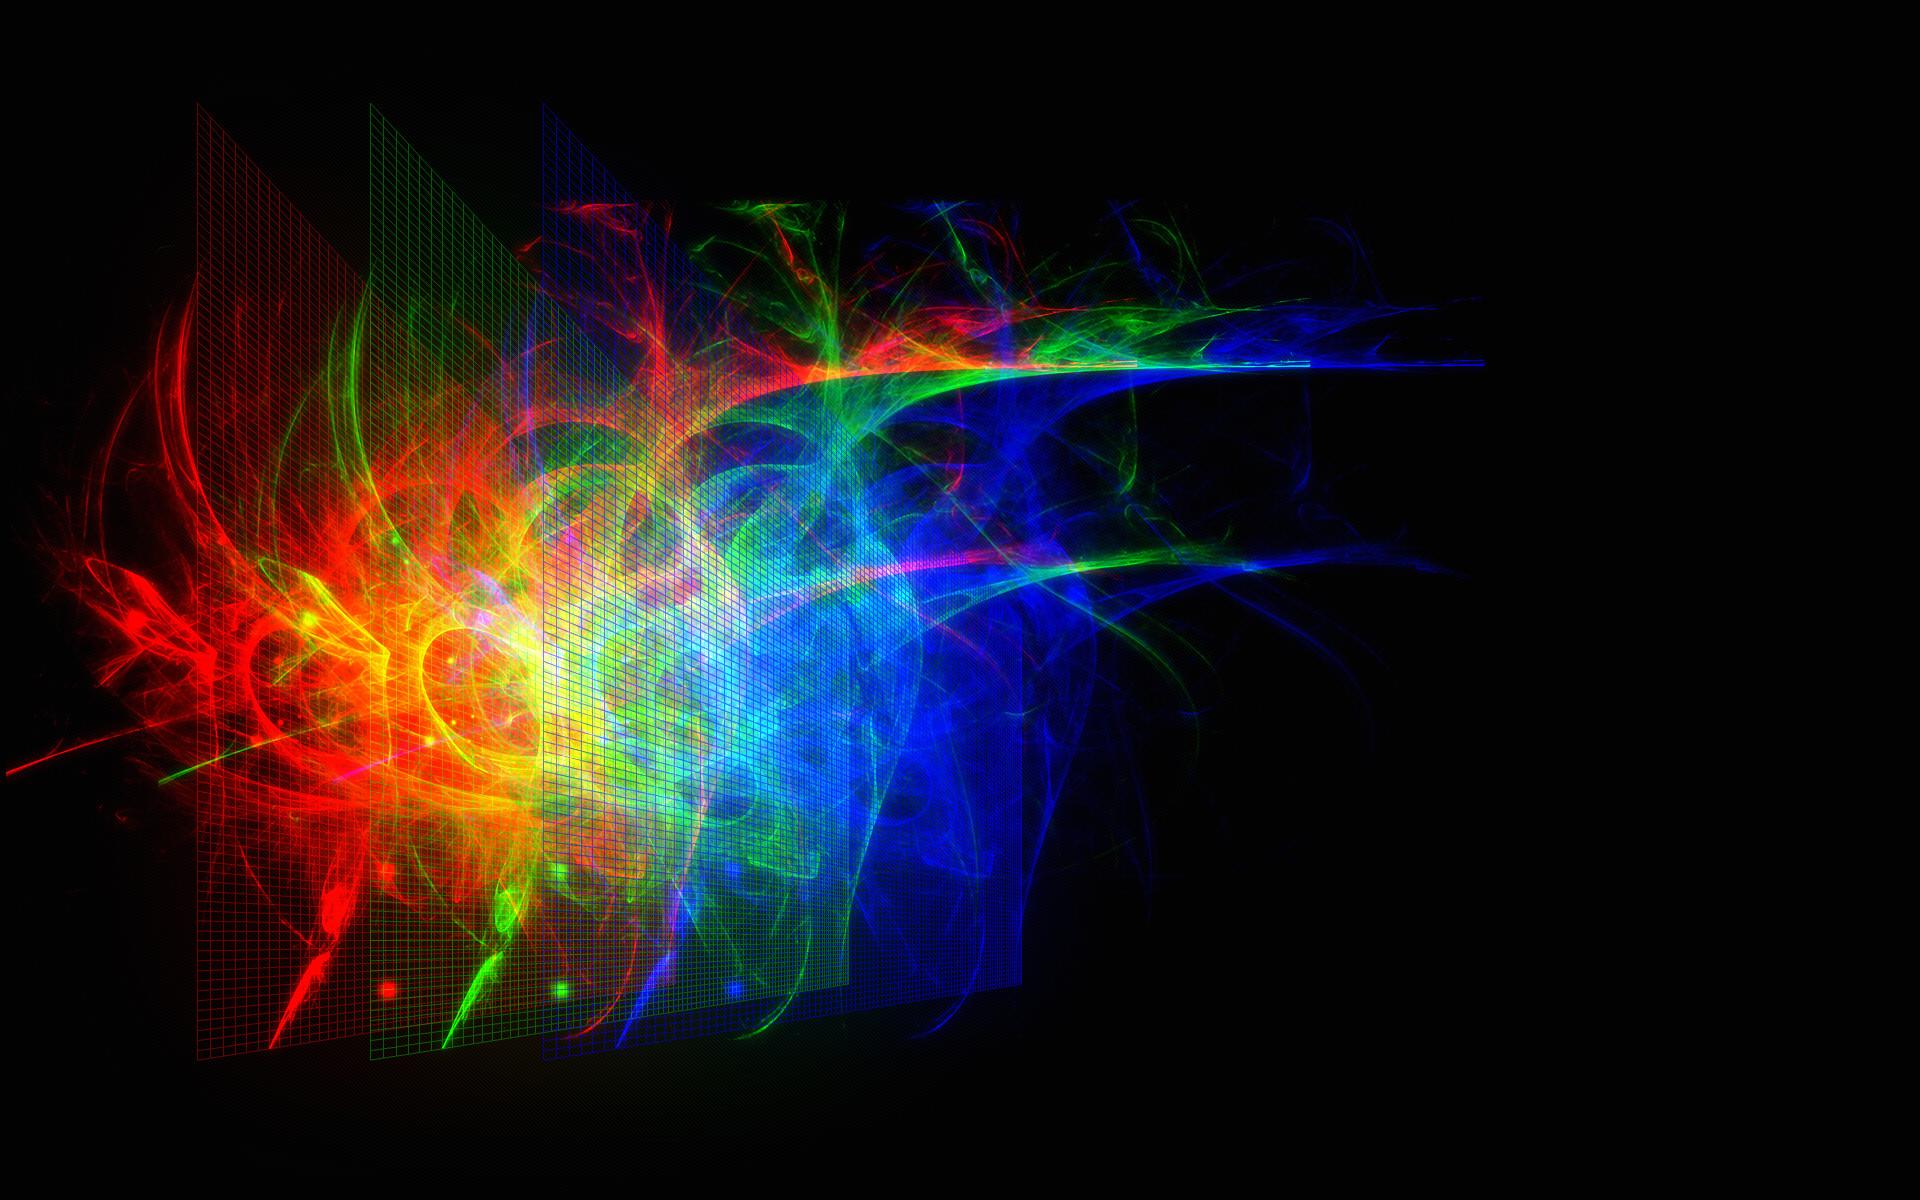 Color Explosion Wallpaper 77 Images